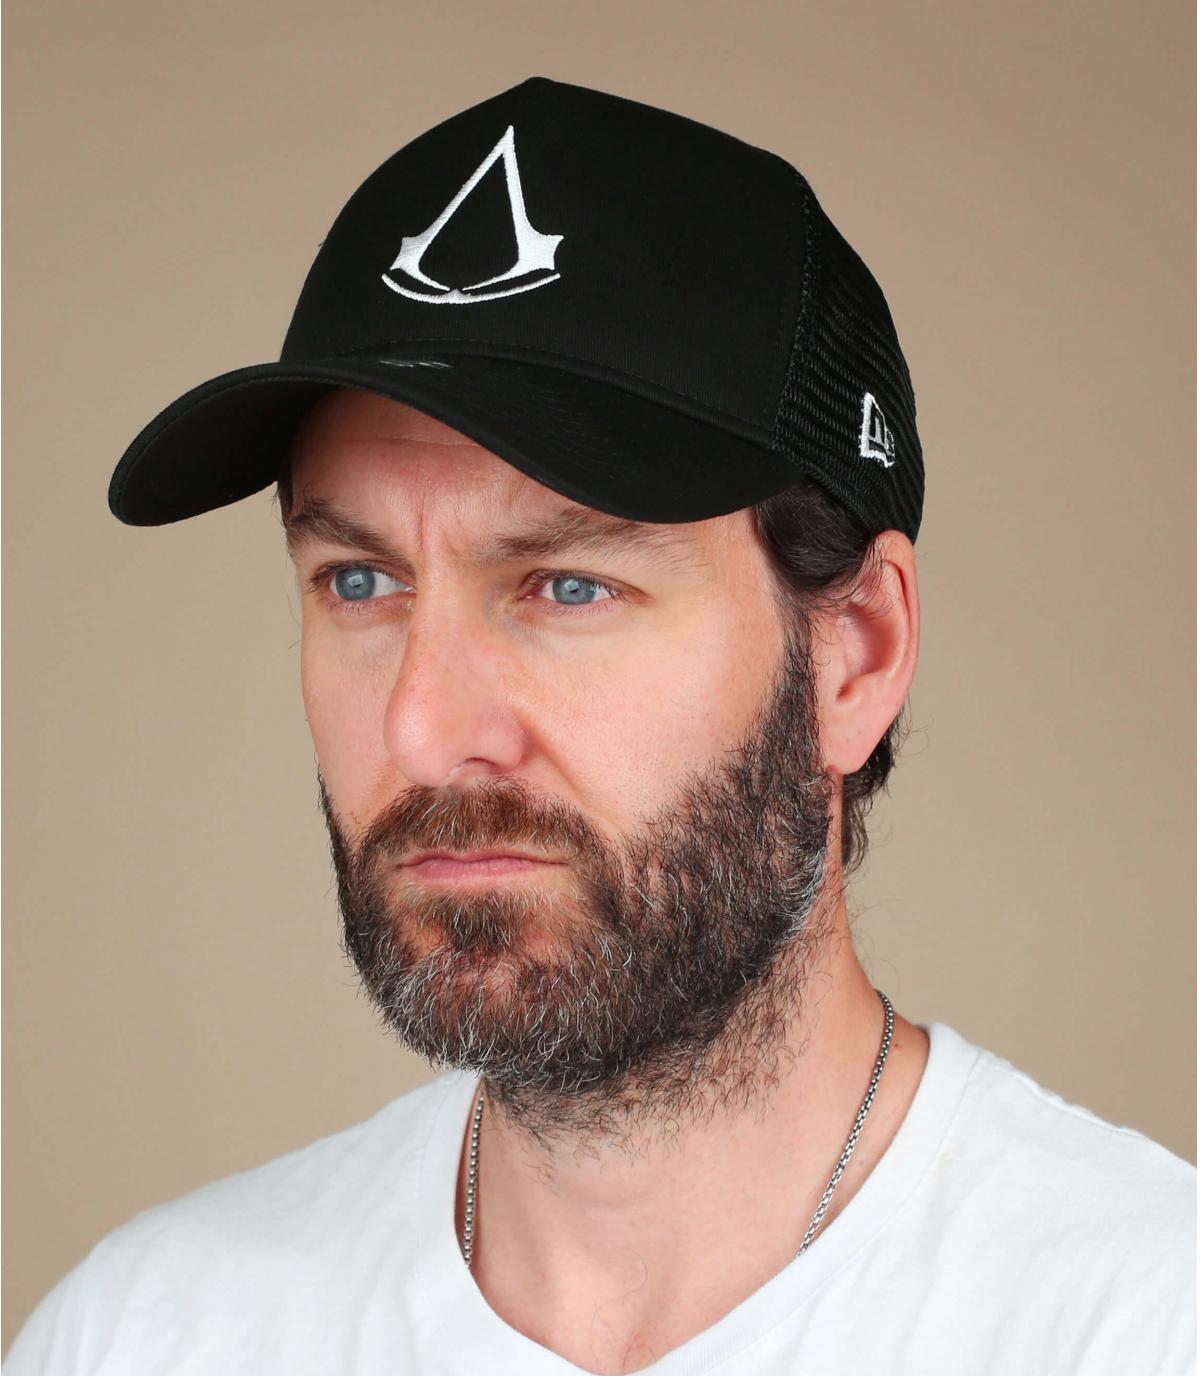 zwarte Assassin's Creed cap